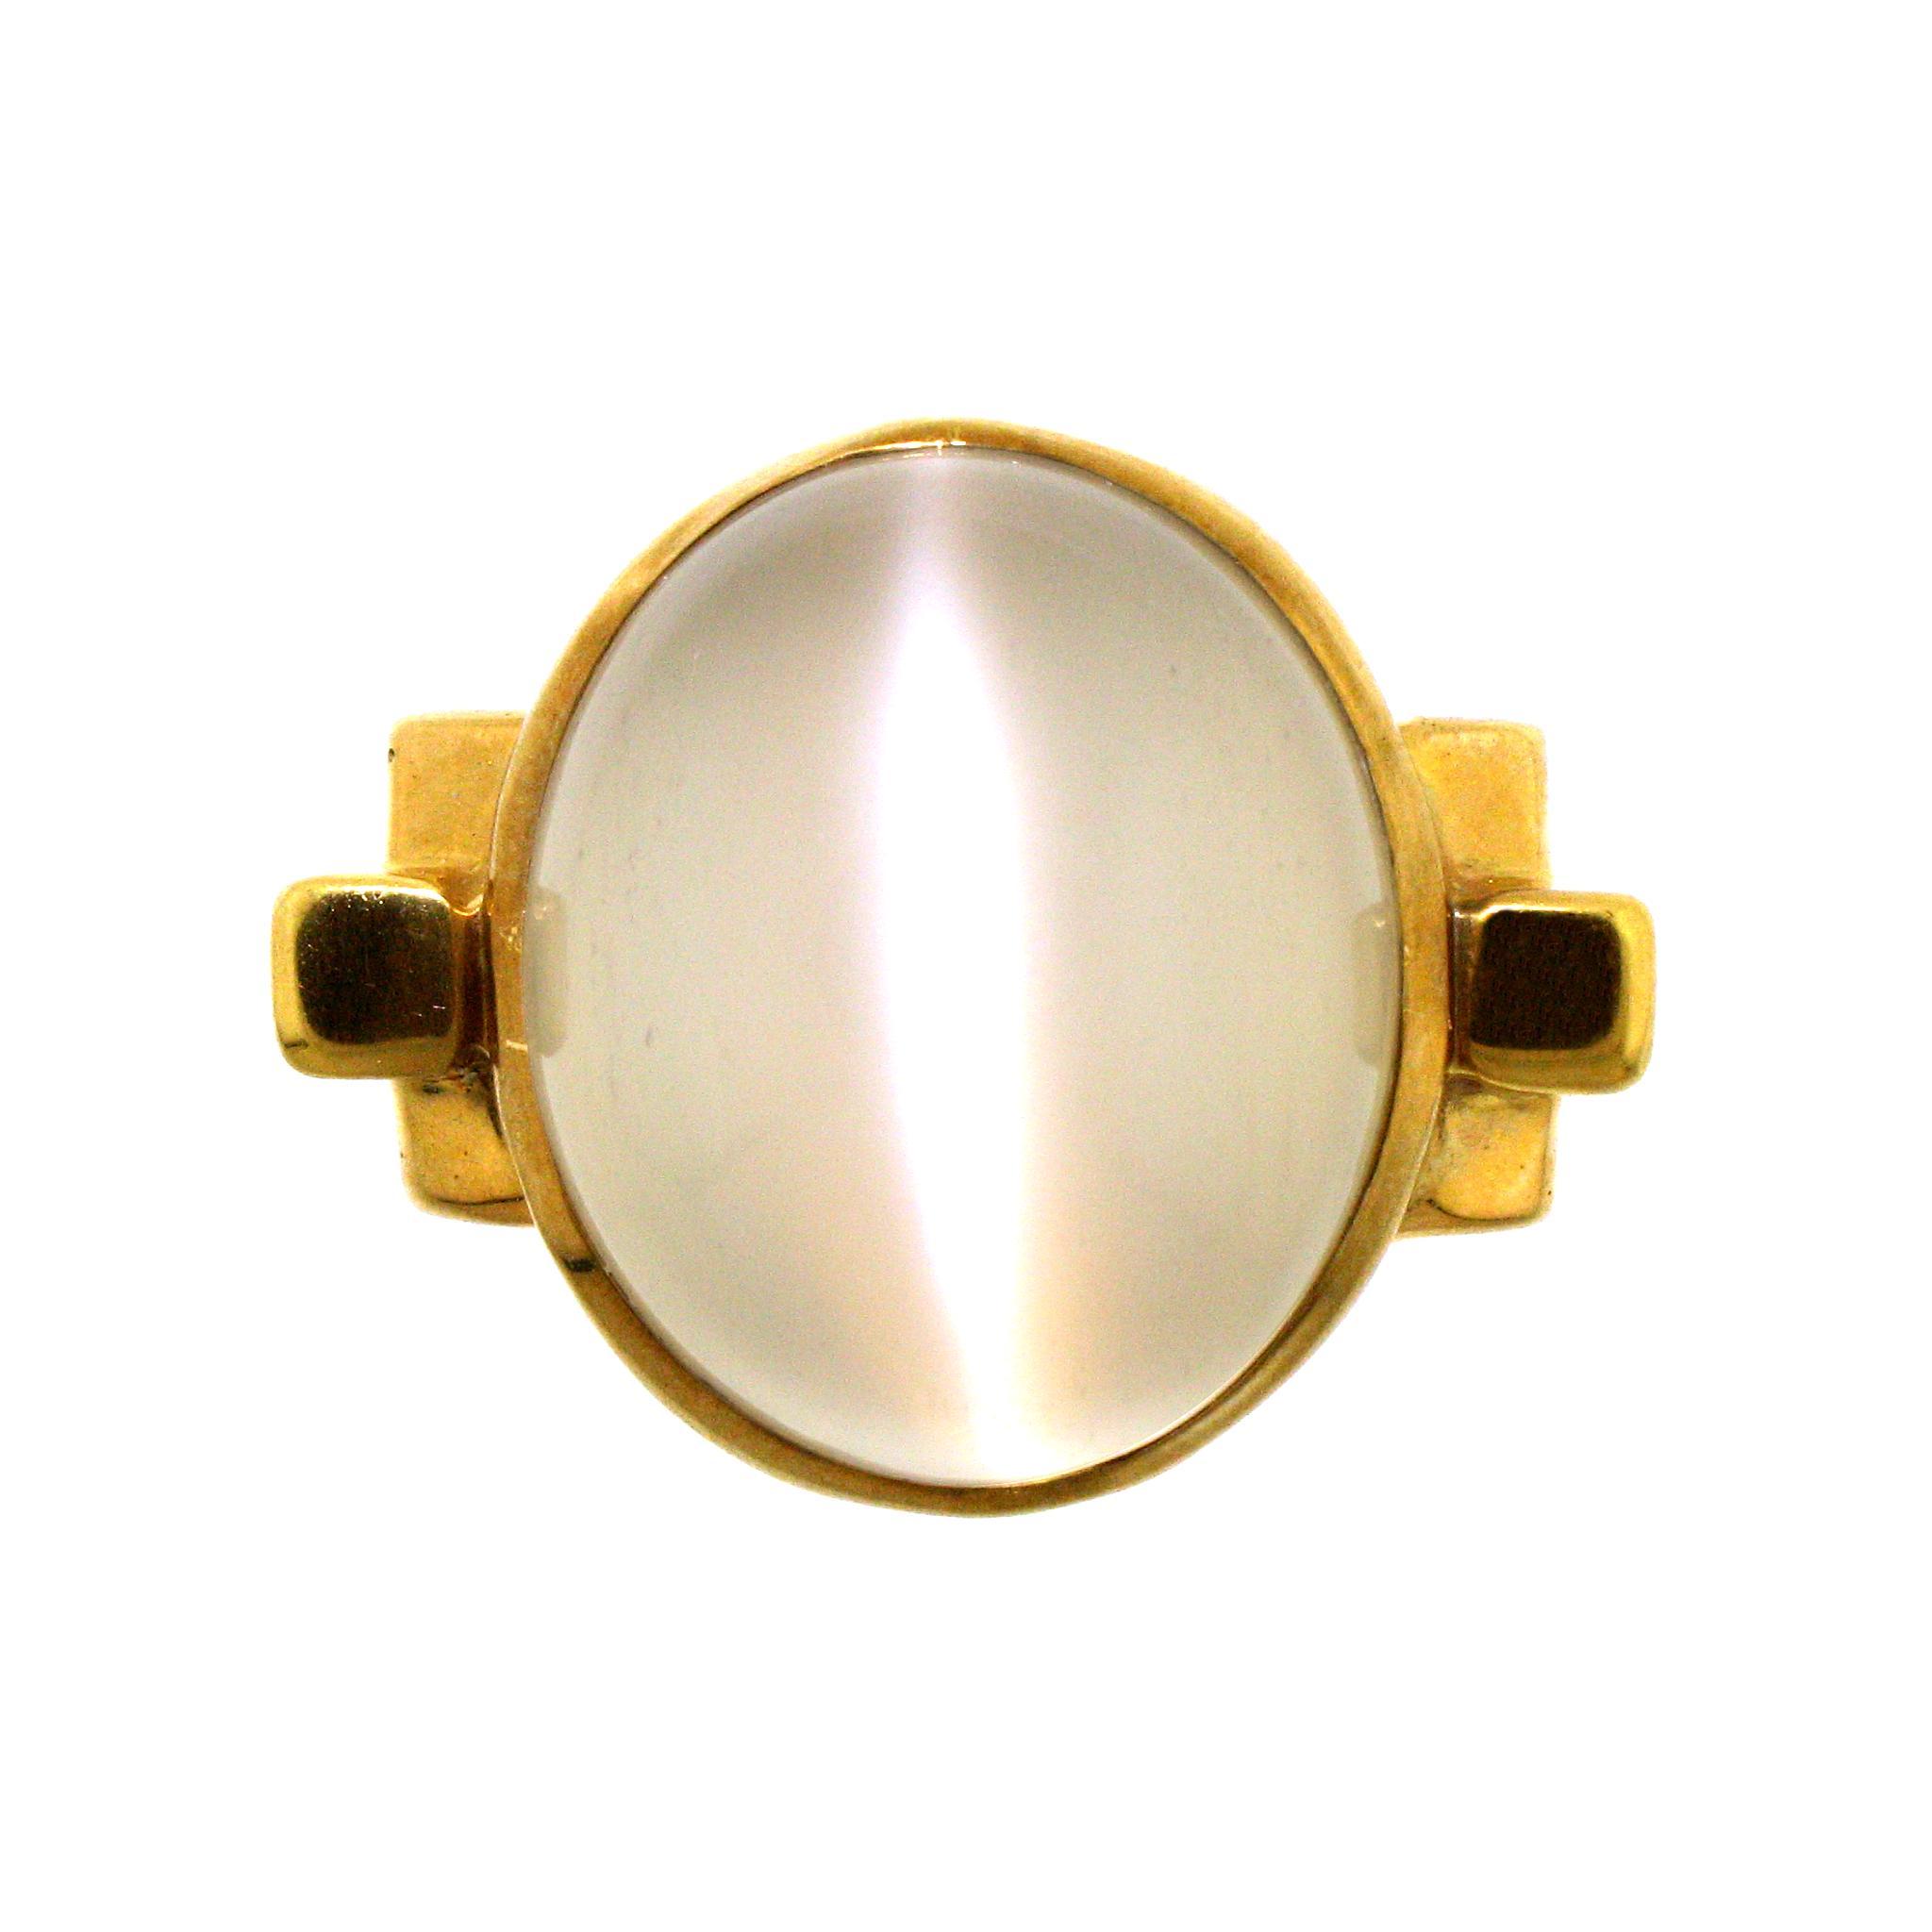 Stunning cat 39 s eye moonstone 18 karat ring from for Cat s eye moonstone jewelry